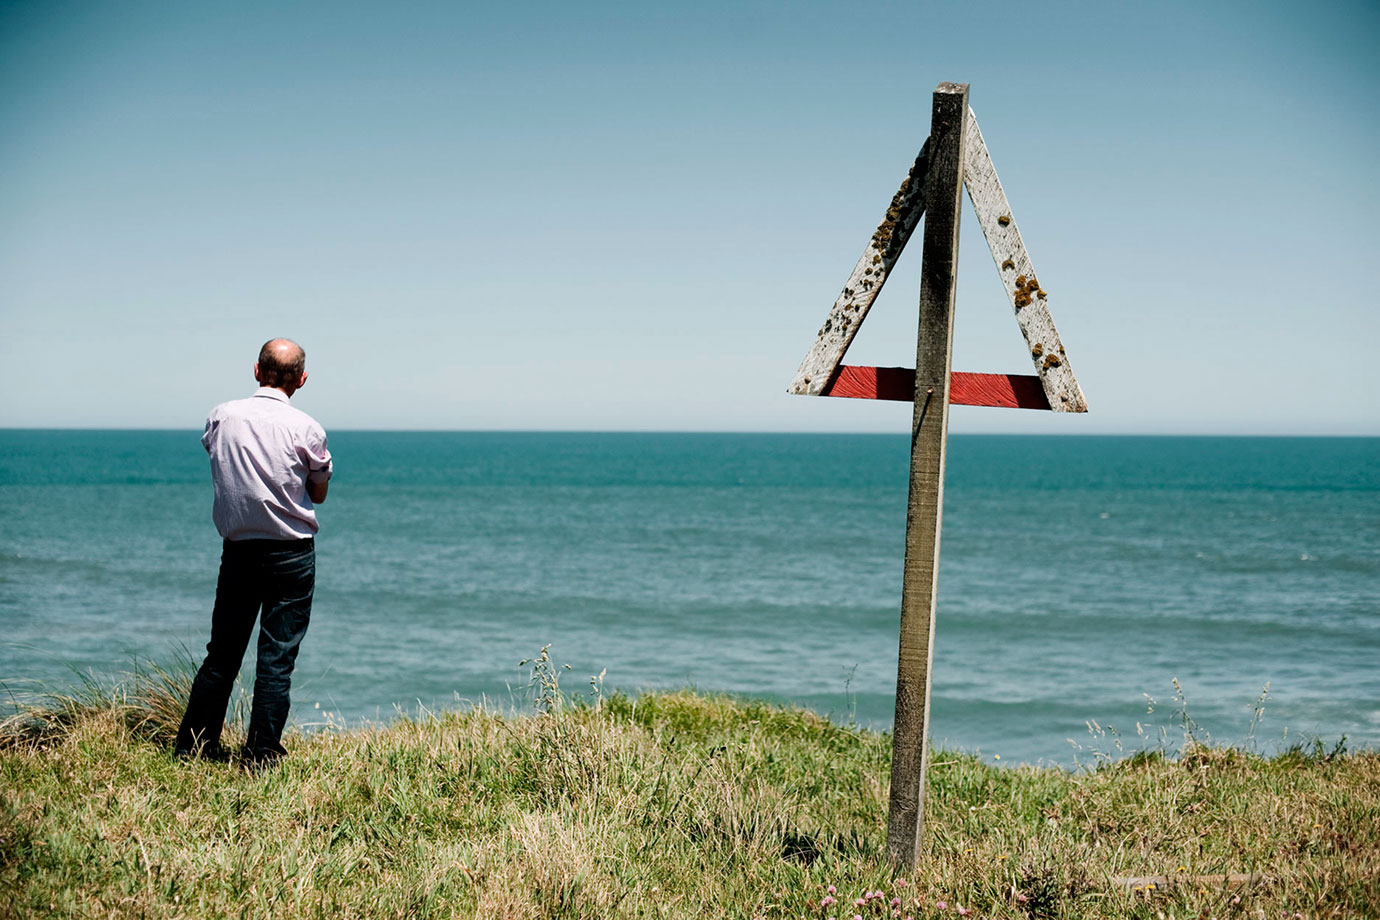 Ohawe,-Man-standing,-2011-Bruce-Foster.jpg